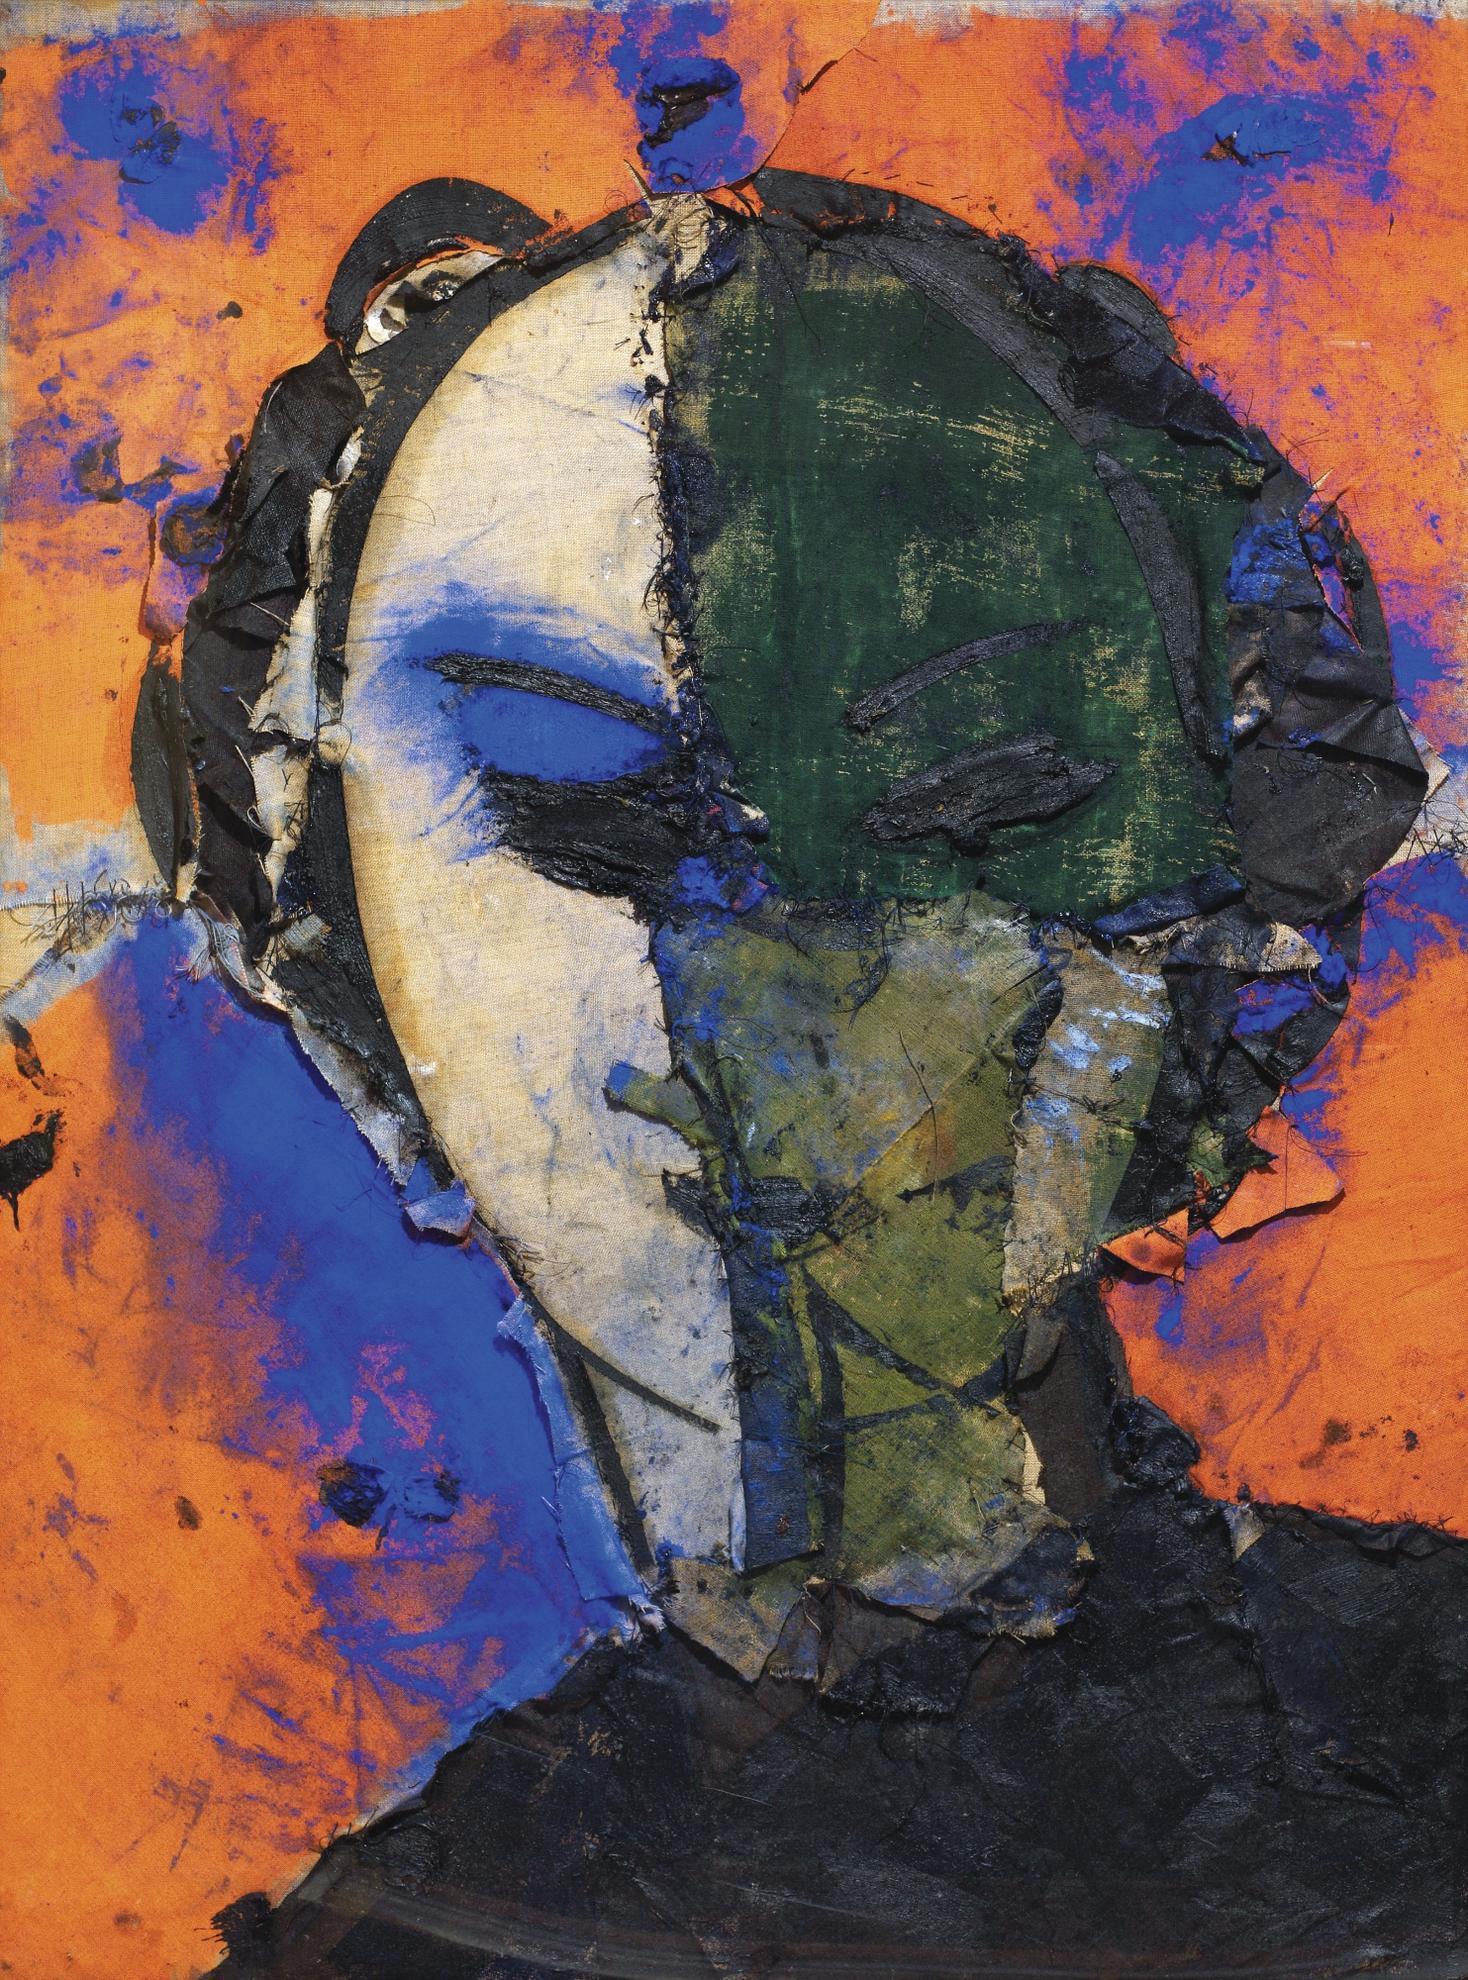 Manolo Valdes-Retrato Con Fondo Naranja-2007